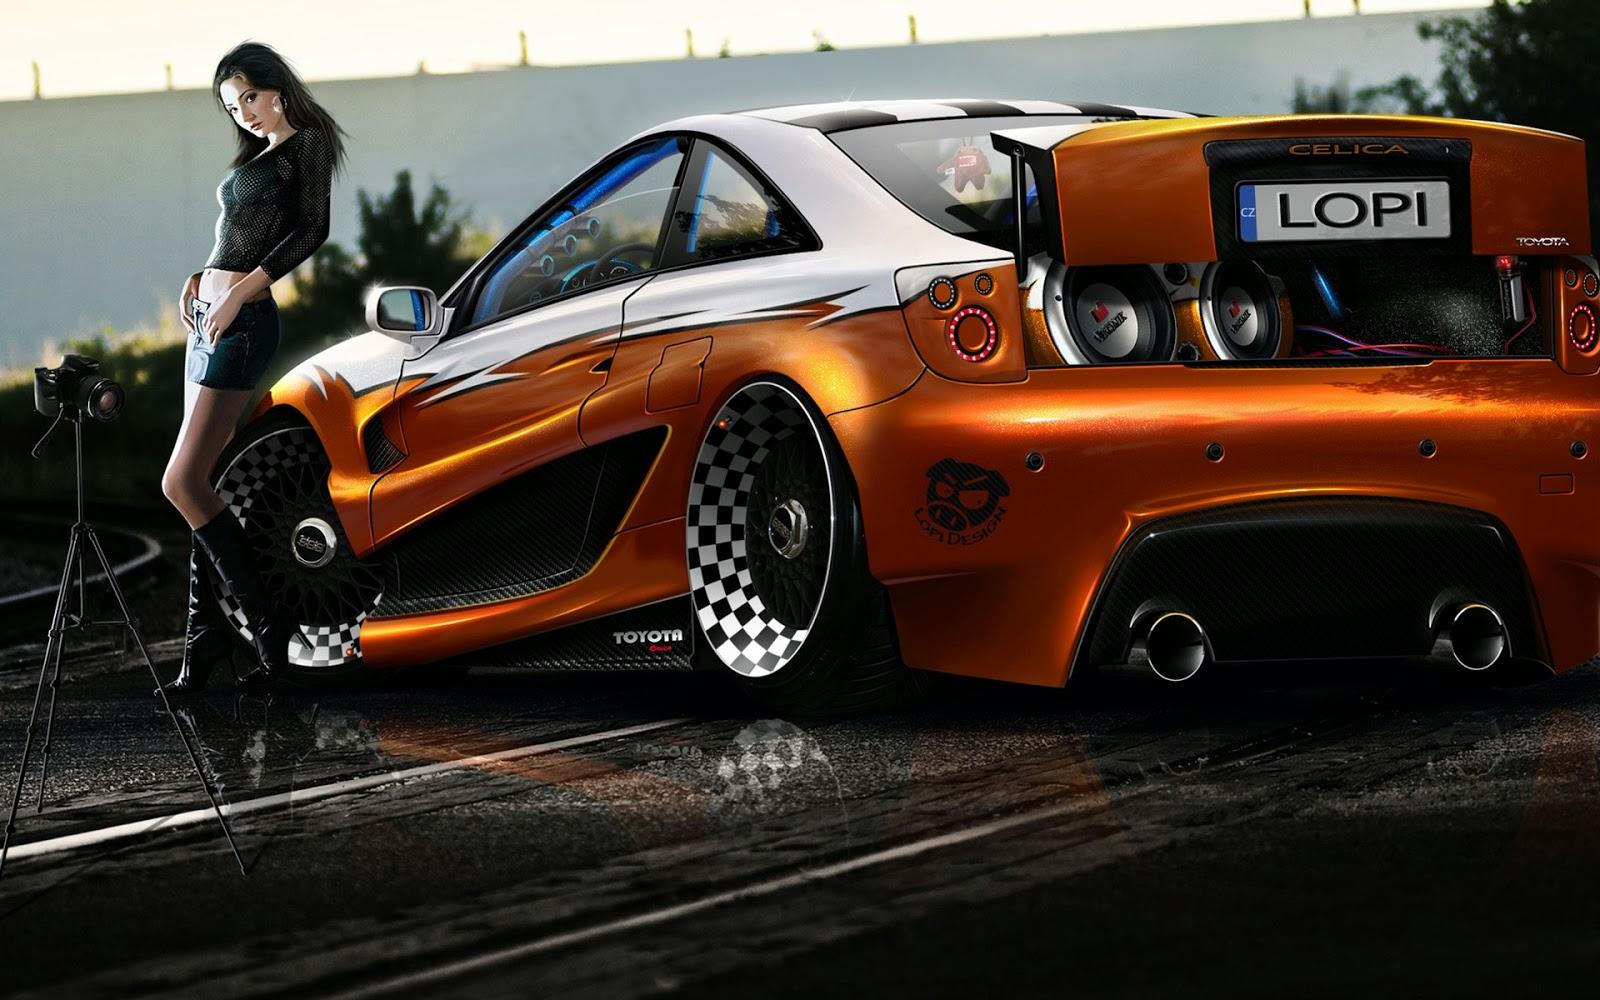 Toyota Celica Tuning New Car Modification